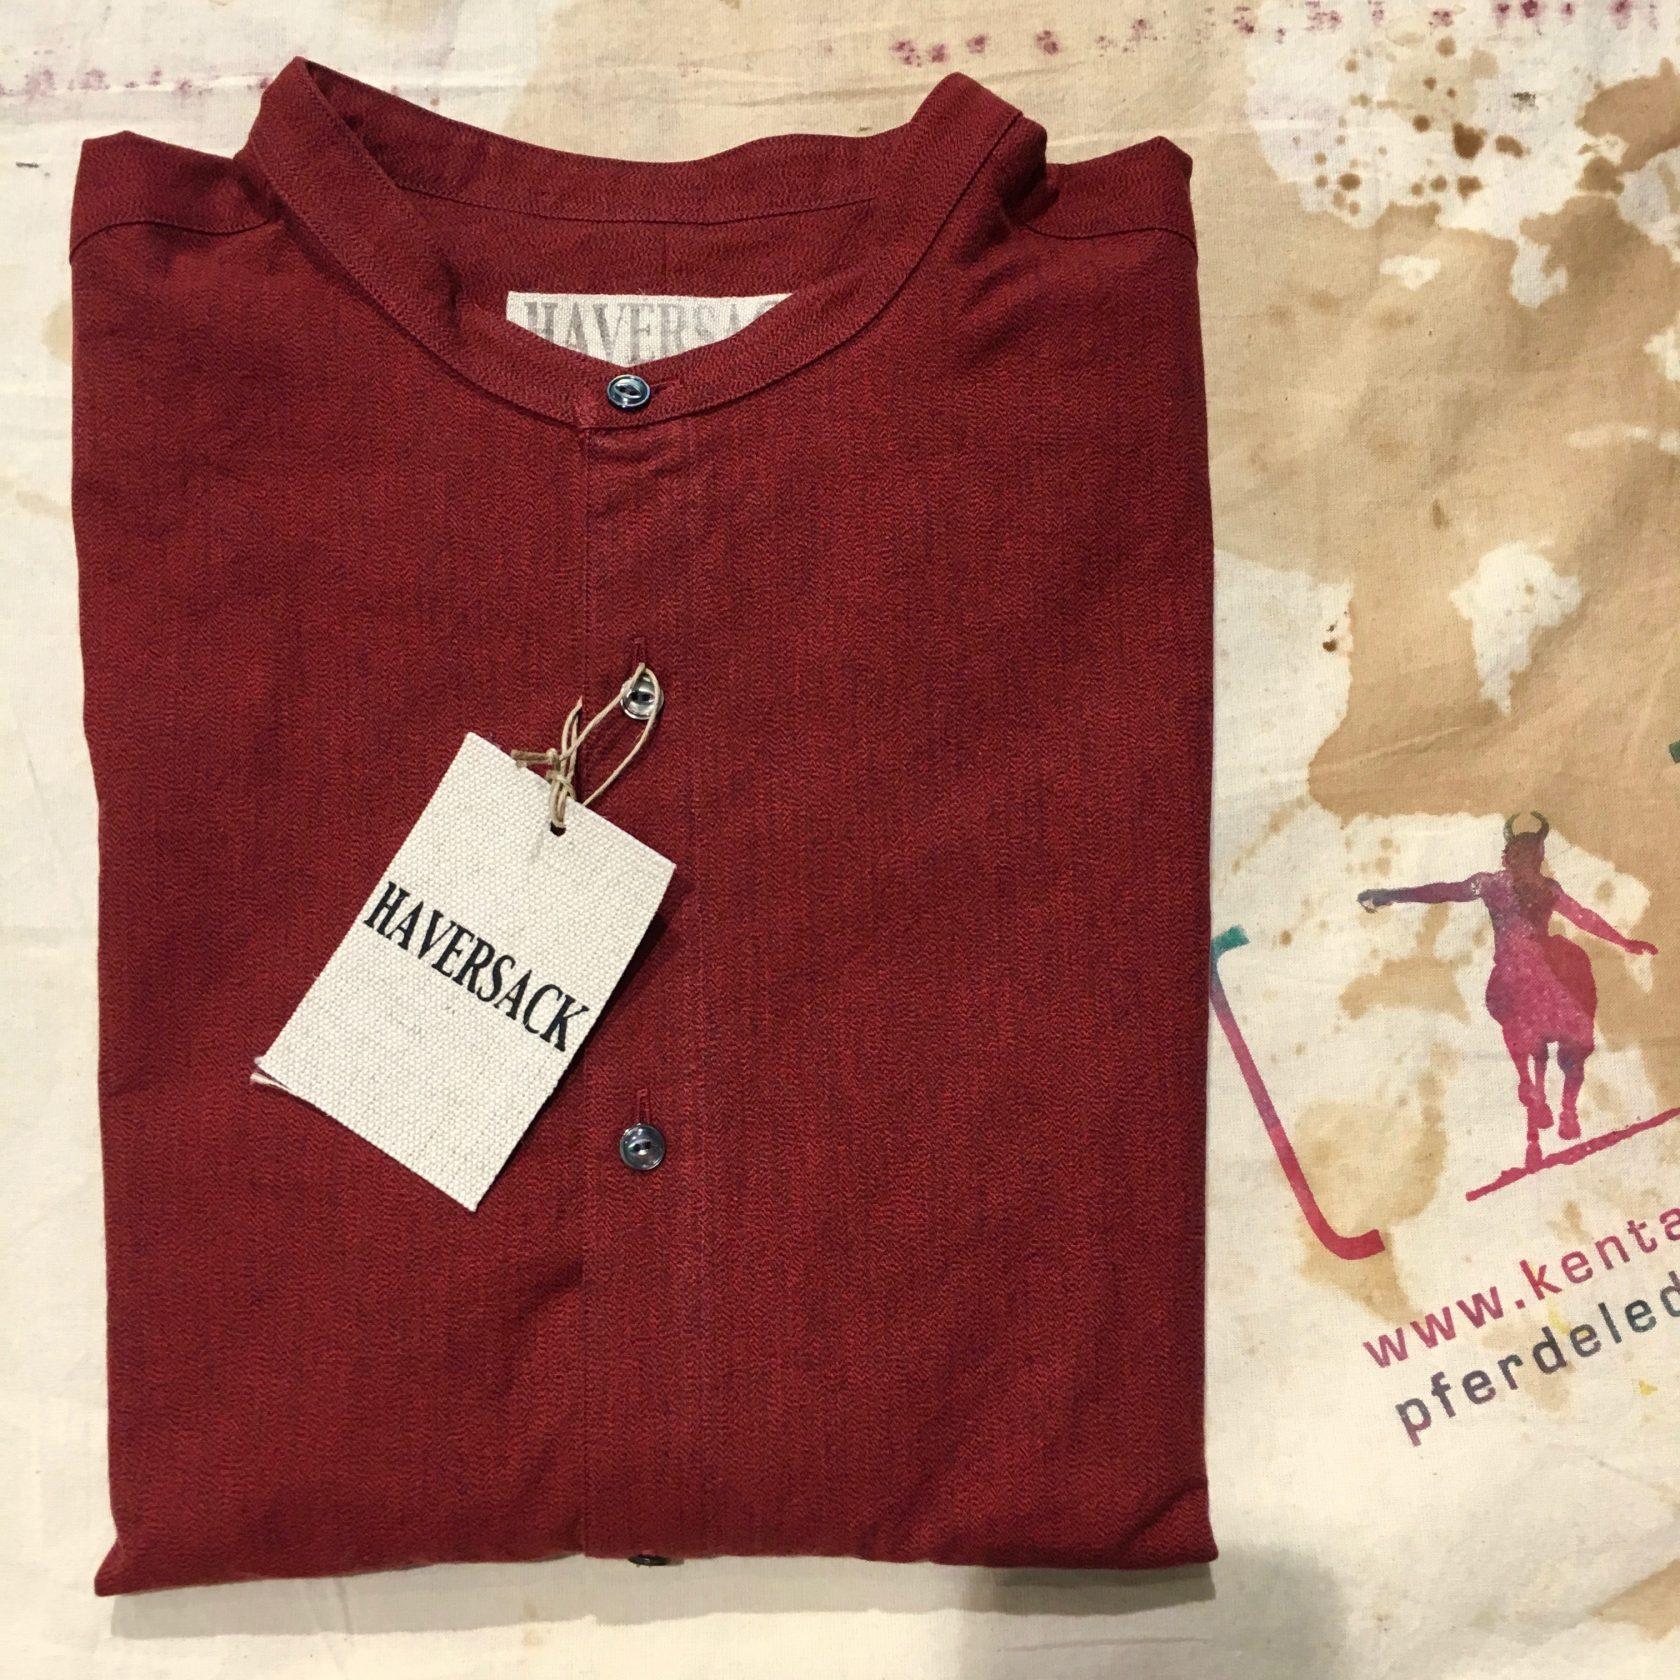 Haversack  red shirt